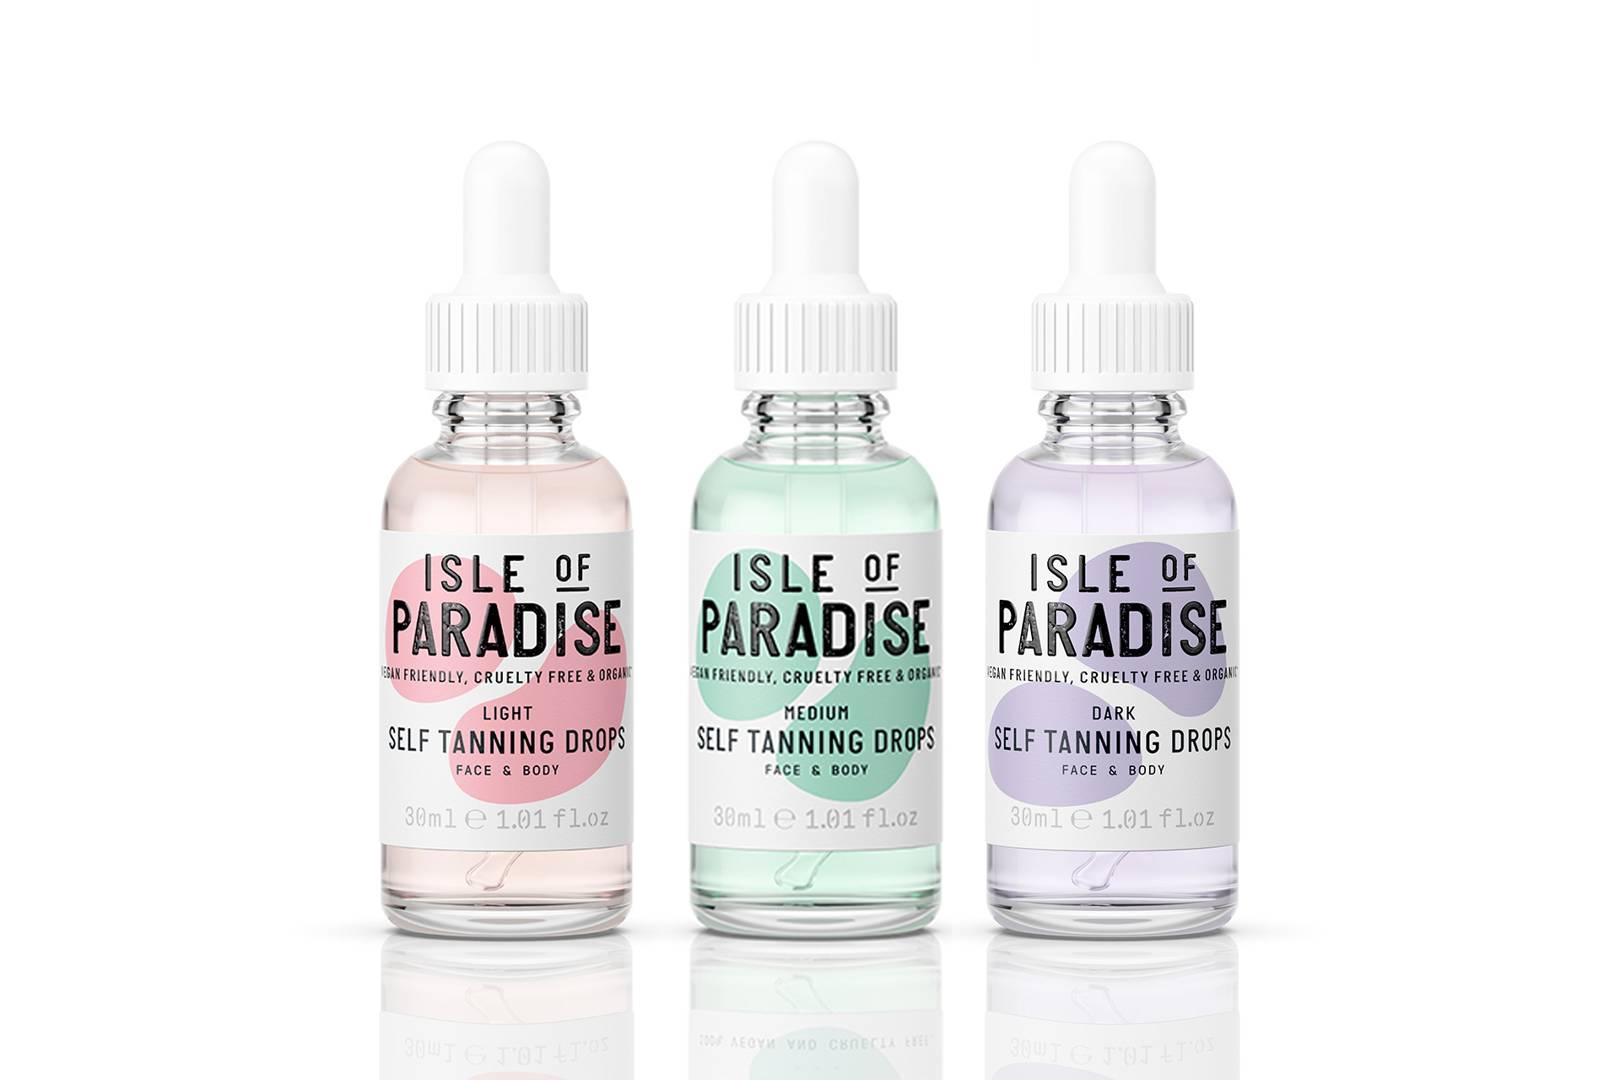 isle of paradise.jpg